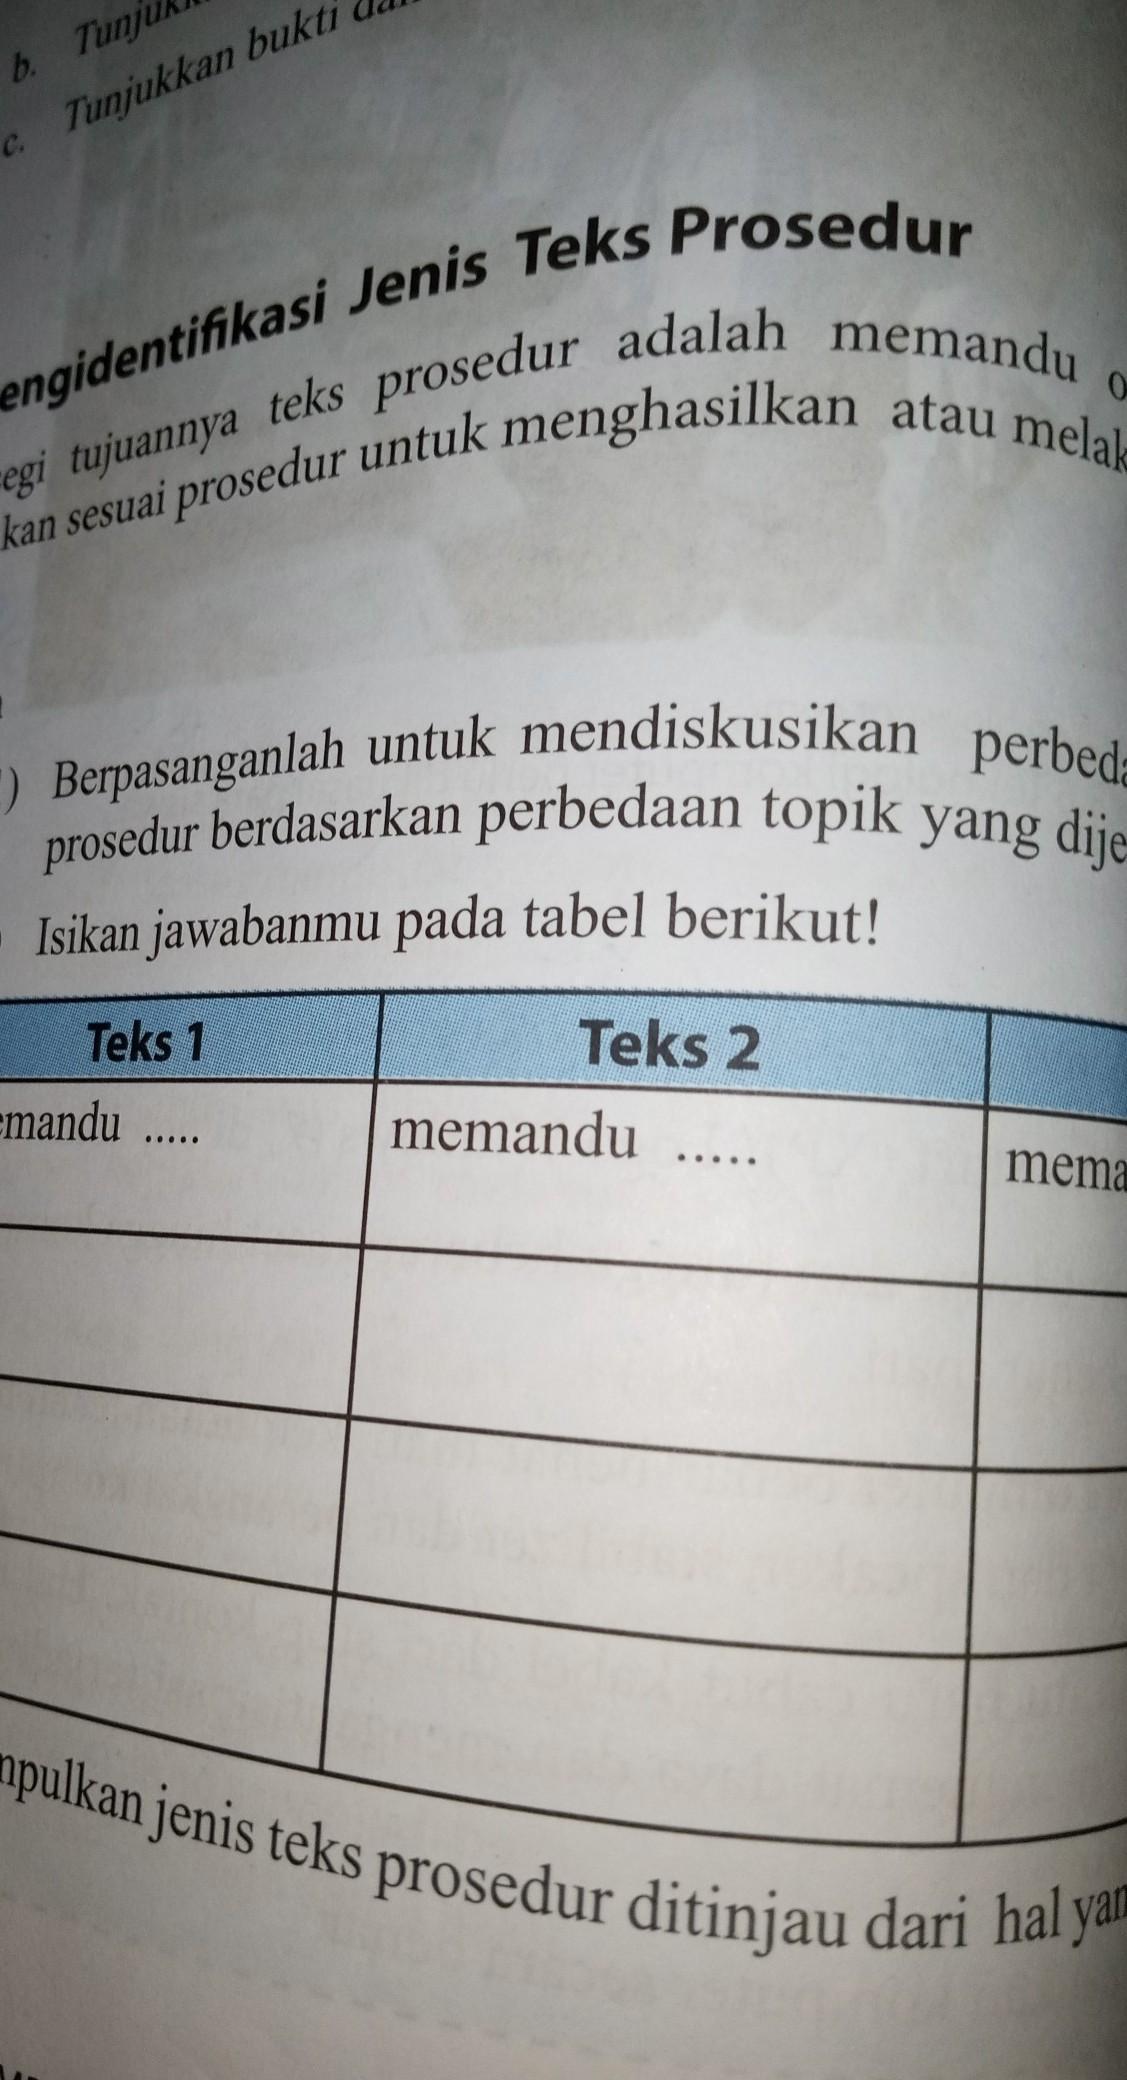 Jenis Jenis Prosedur : jenis, prosedur, Mengidentifikasi, Jenis, Prosedur, IlmuSosial.id